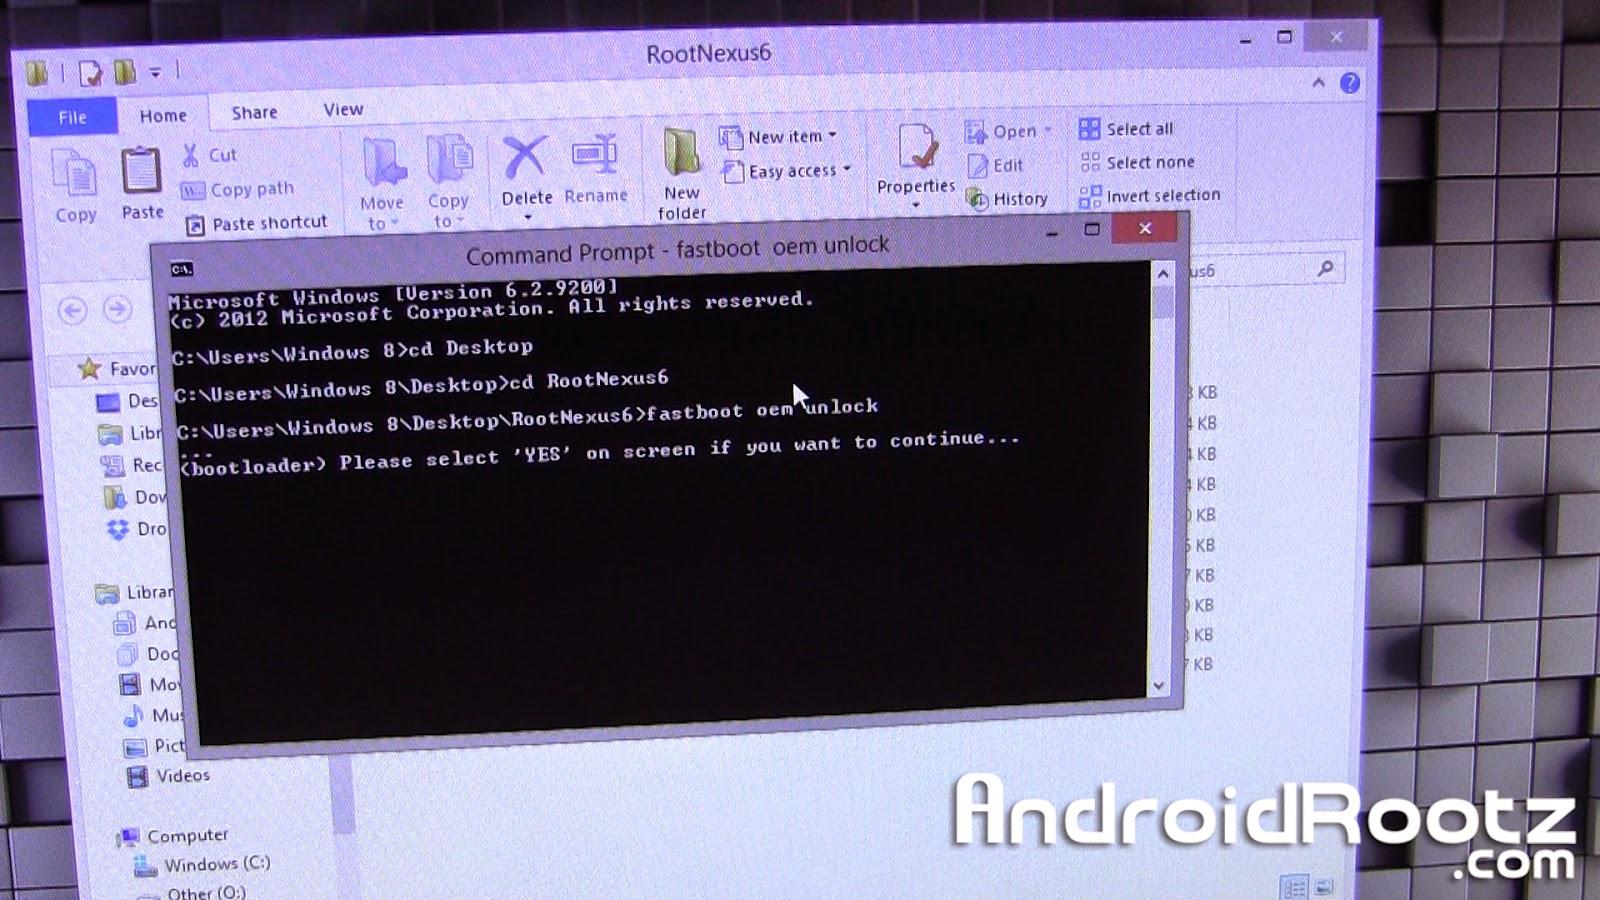 How to Root Nexus 6! [Windows/Mac/Linux/Ubuntu